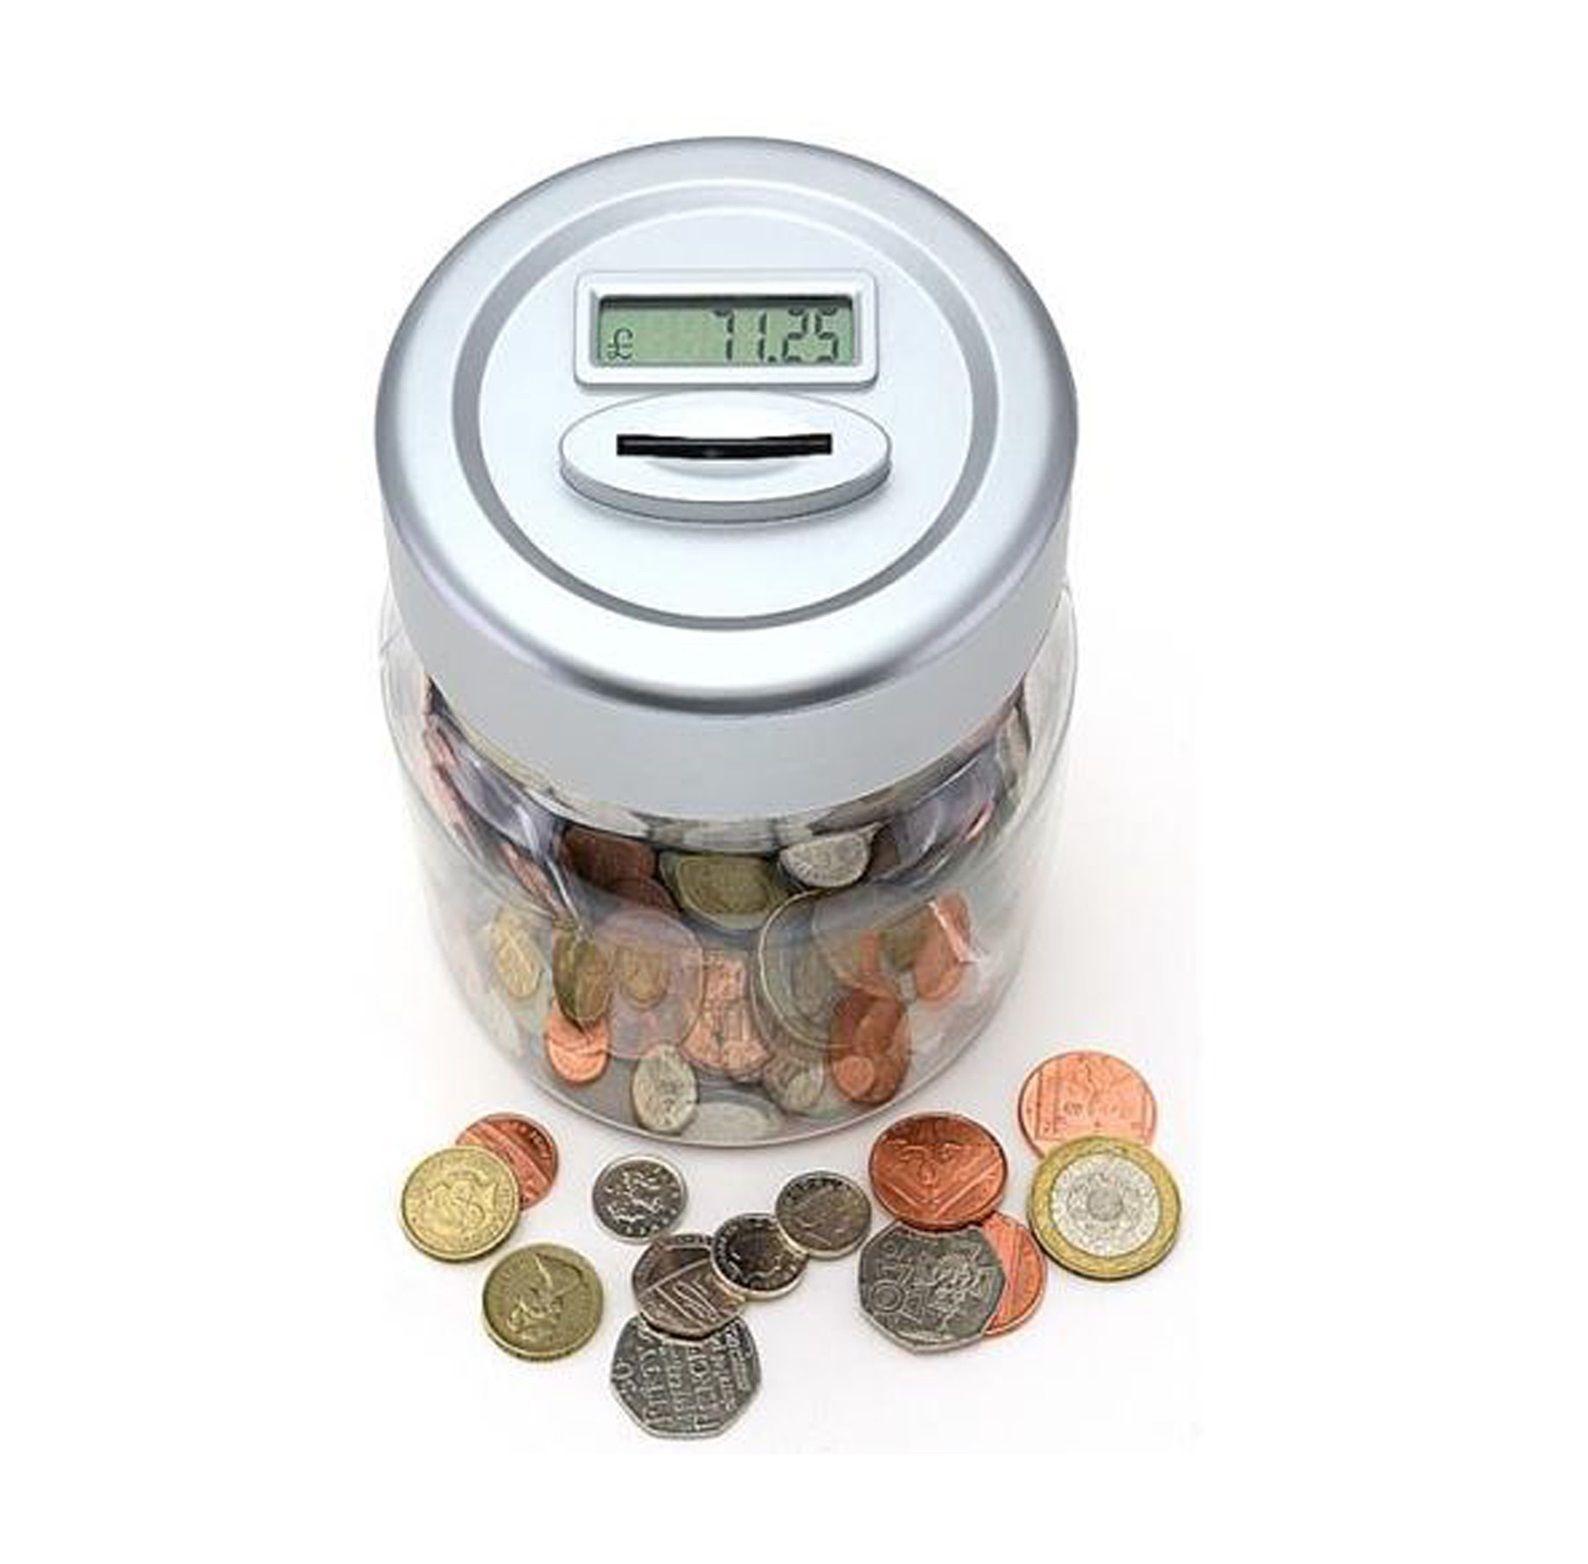 Uk Pound Lcd Display Digital Coin Counting Jar Piggy Bank